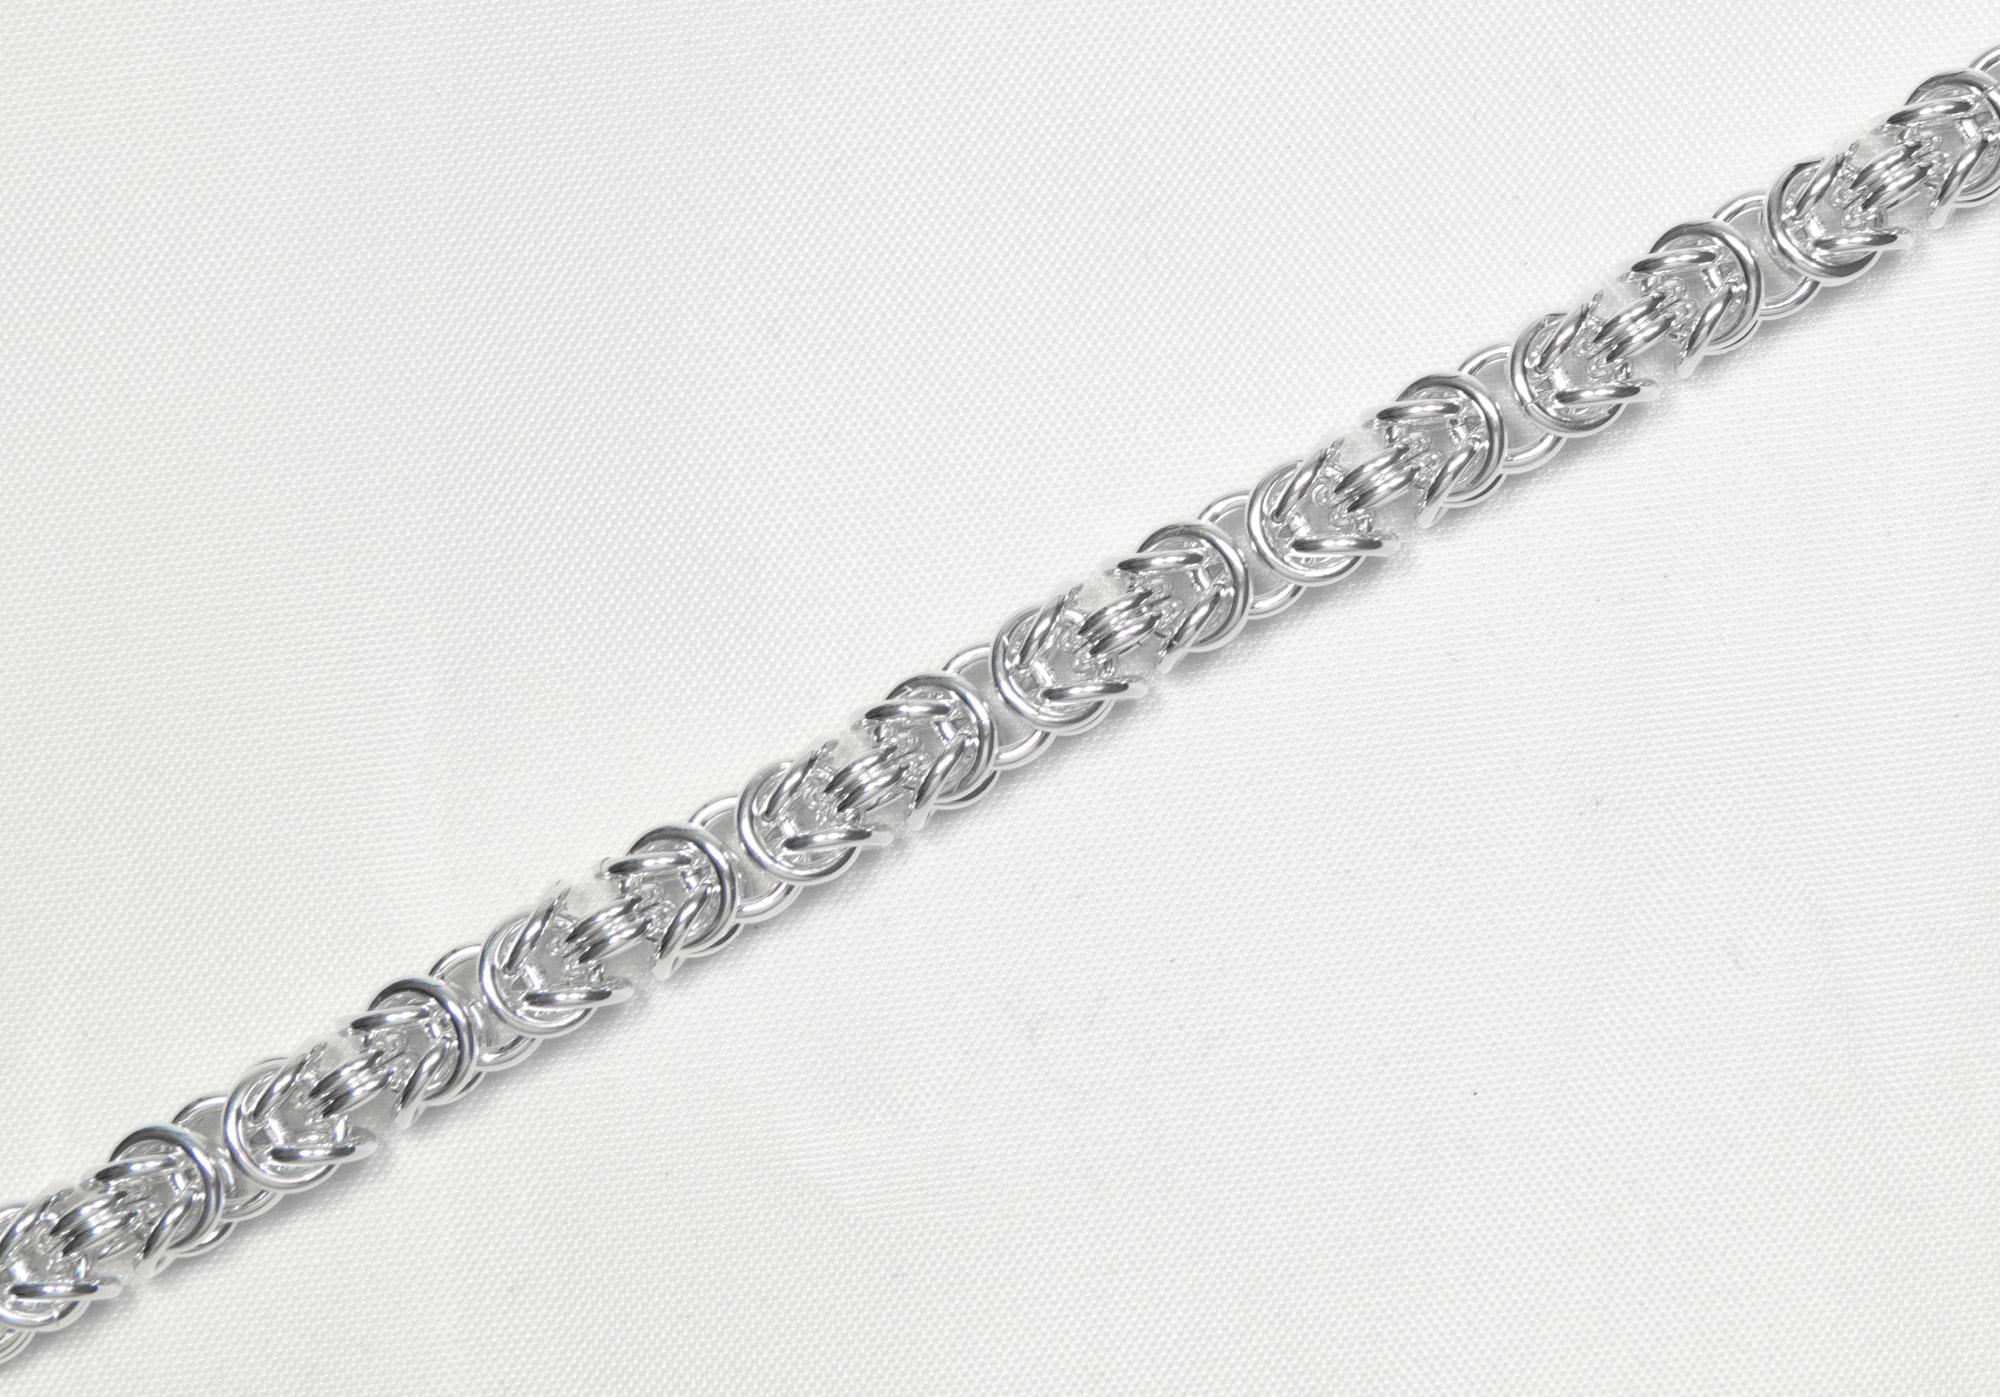 Konge - armbånd sølv